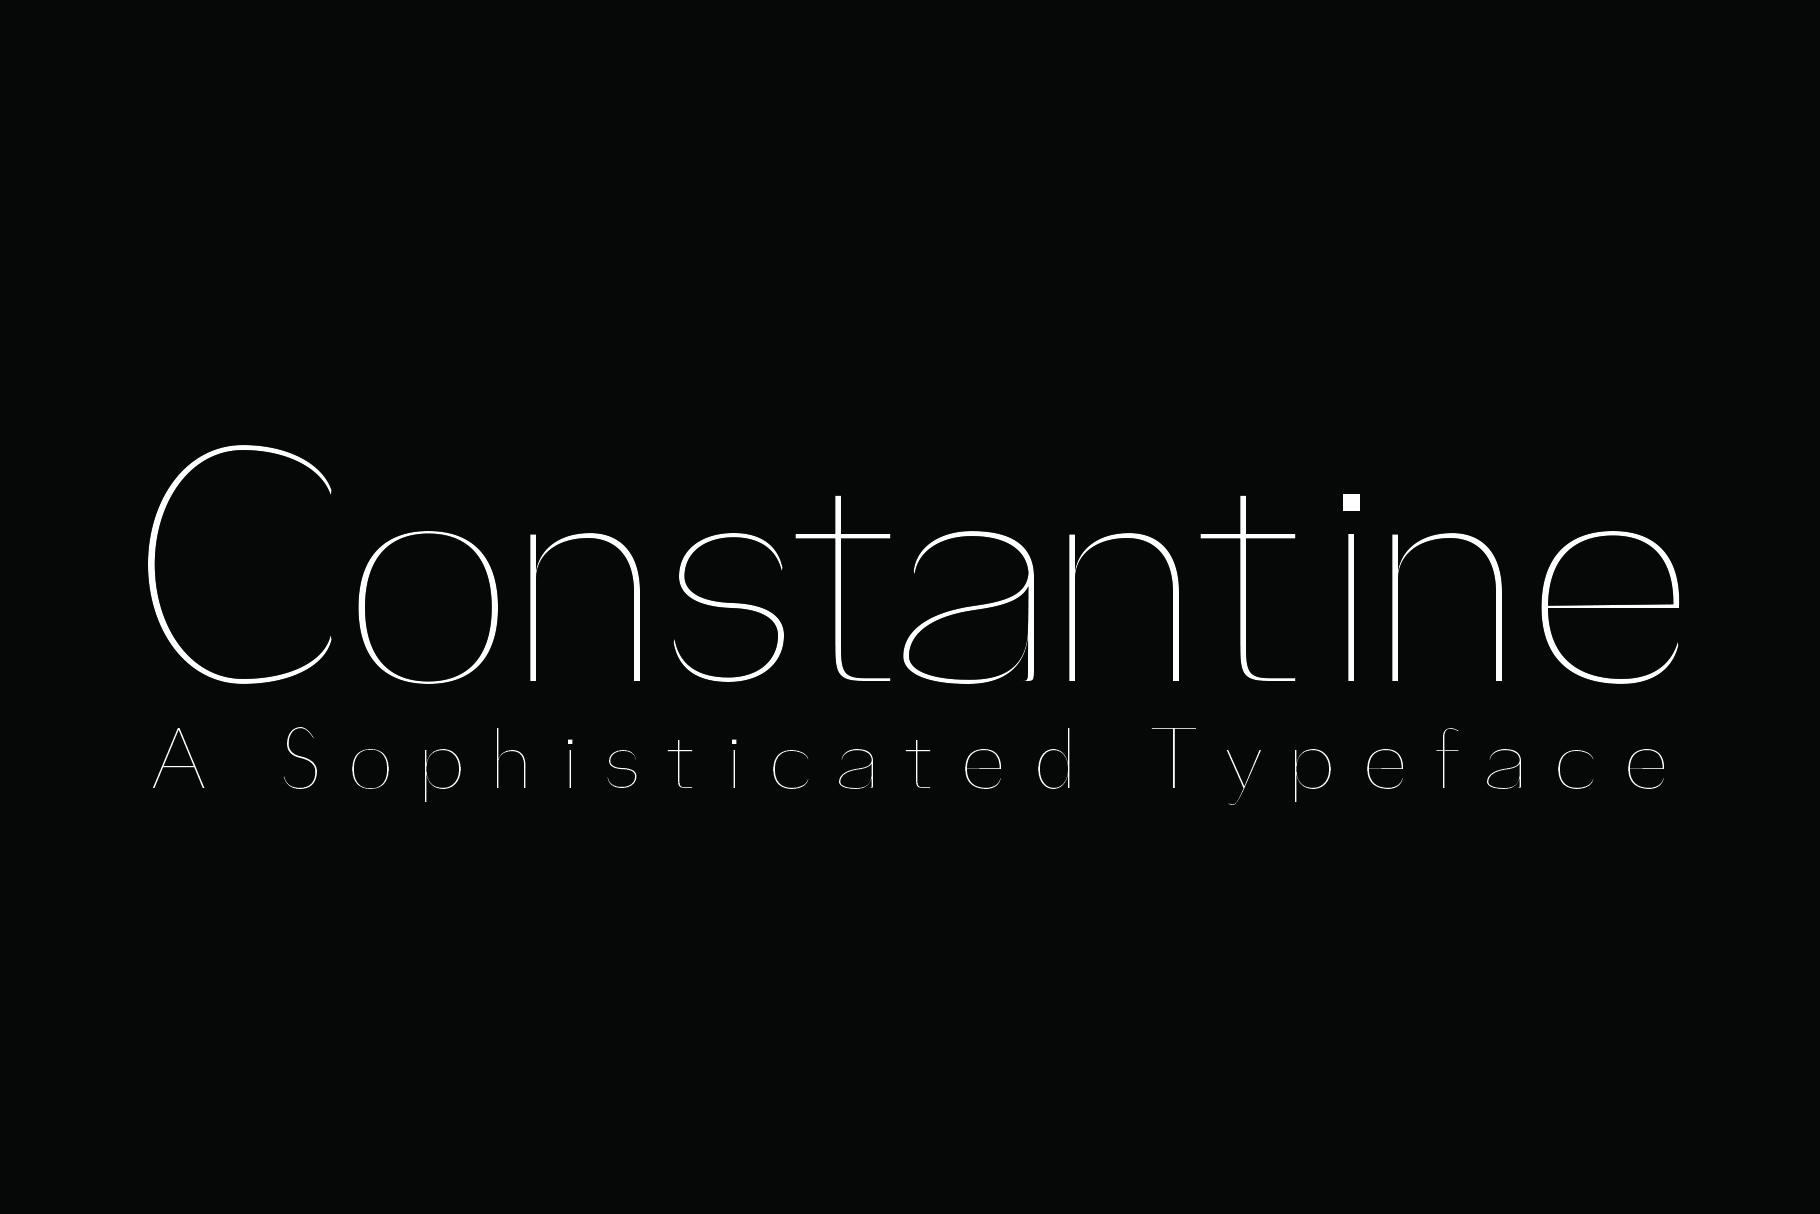 Constantine example image 1